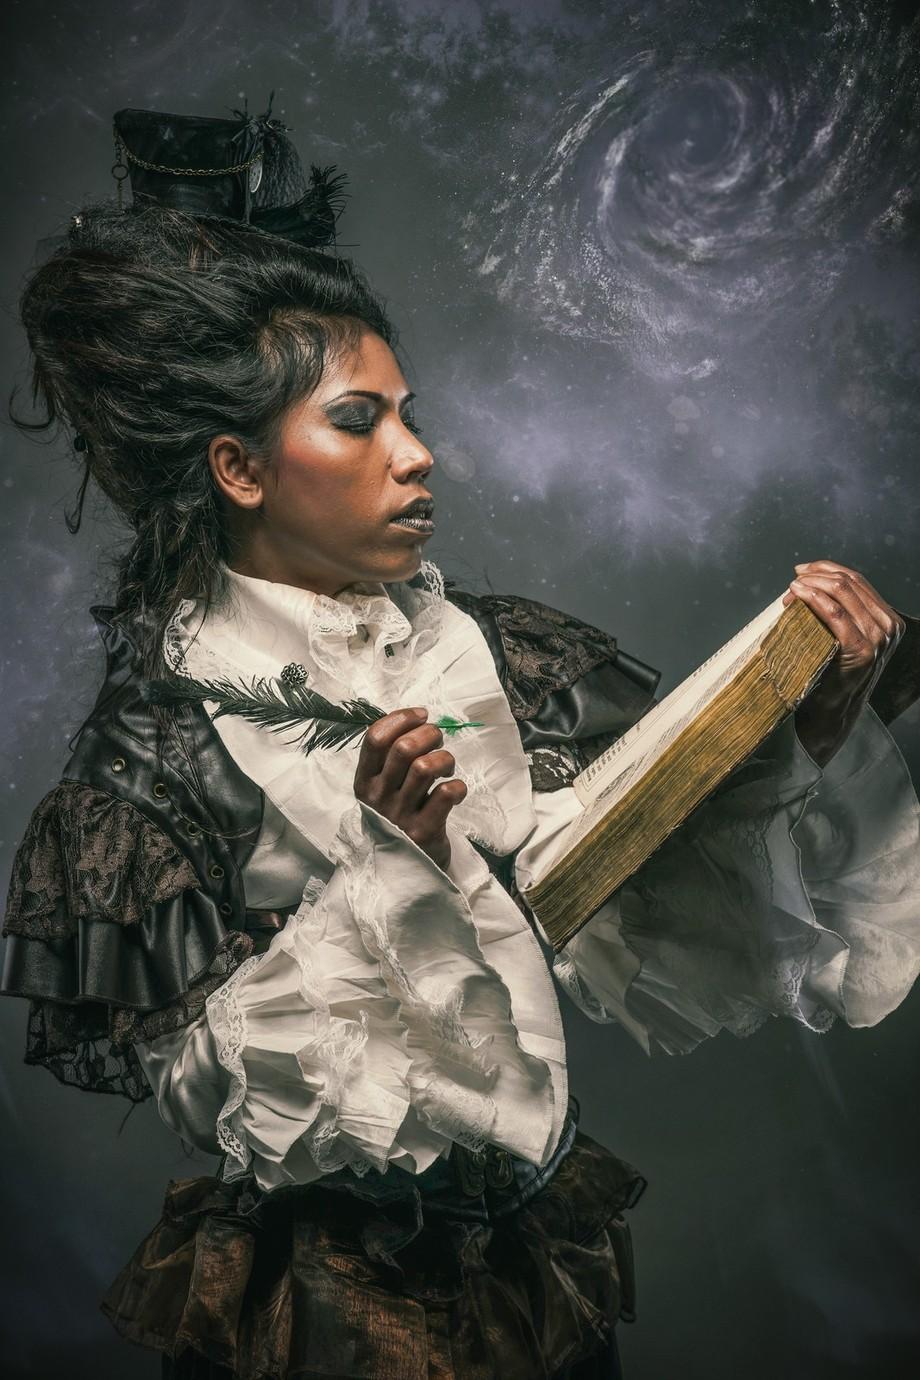 THE BOOK by KoreaSaii - A Fantasy World Photo Contest